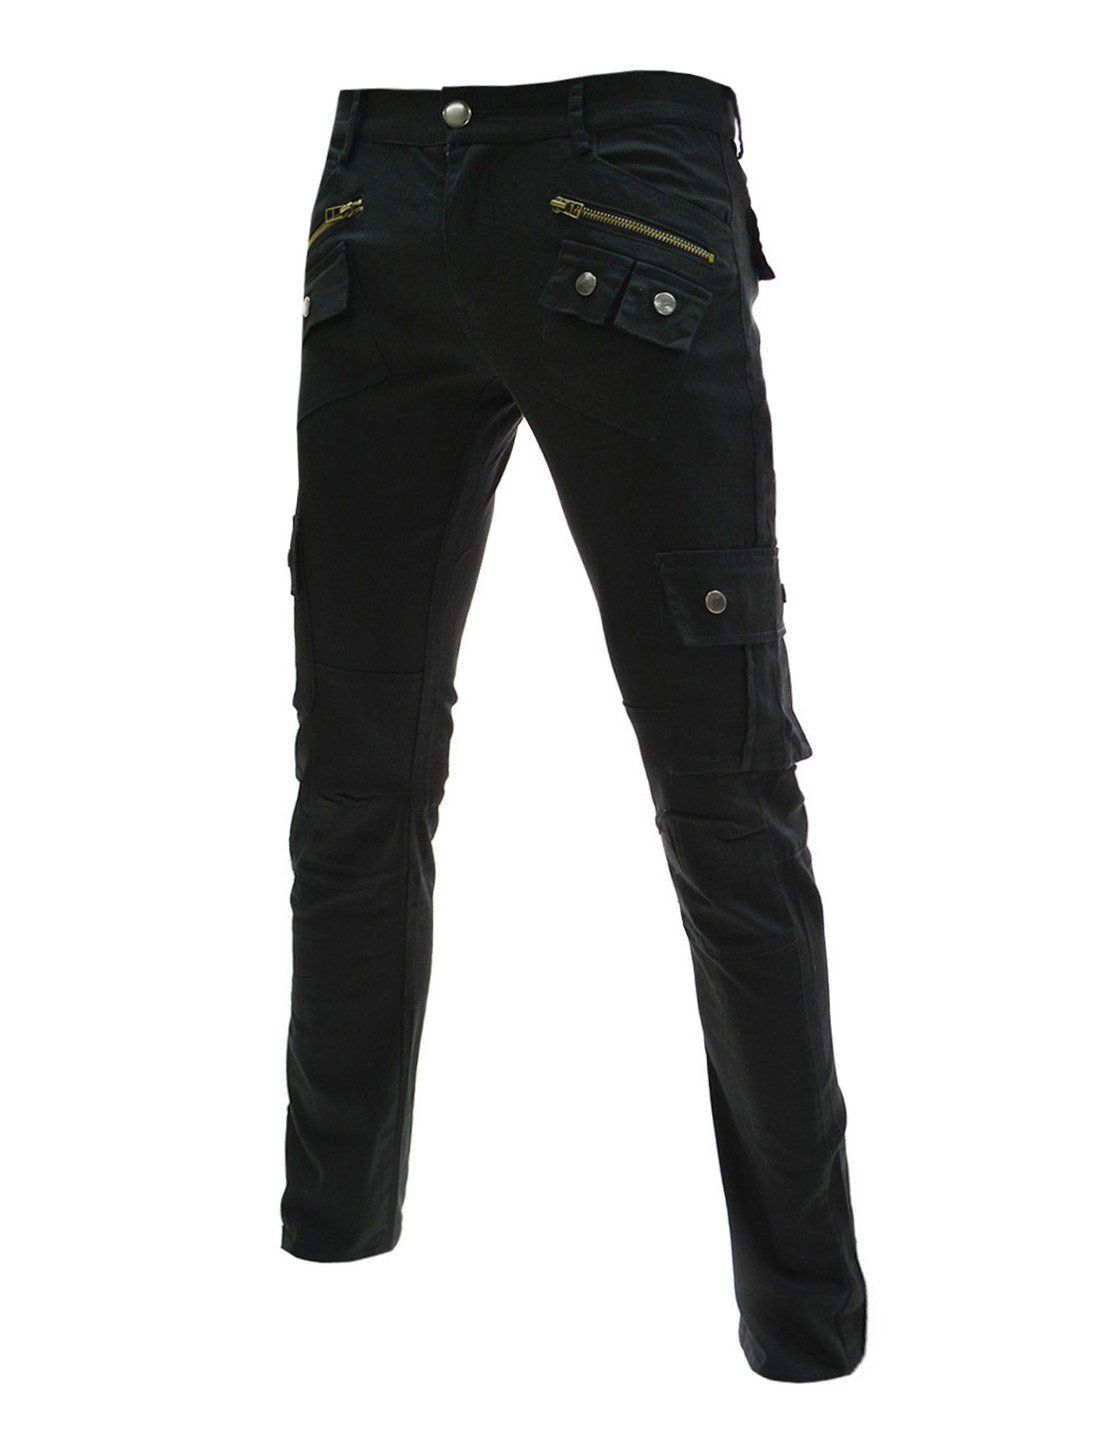 men's slim fit cargo pants black